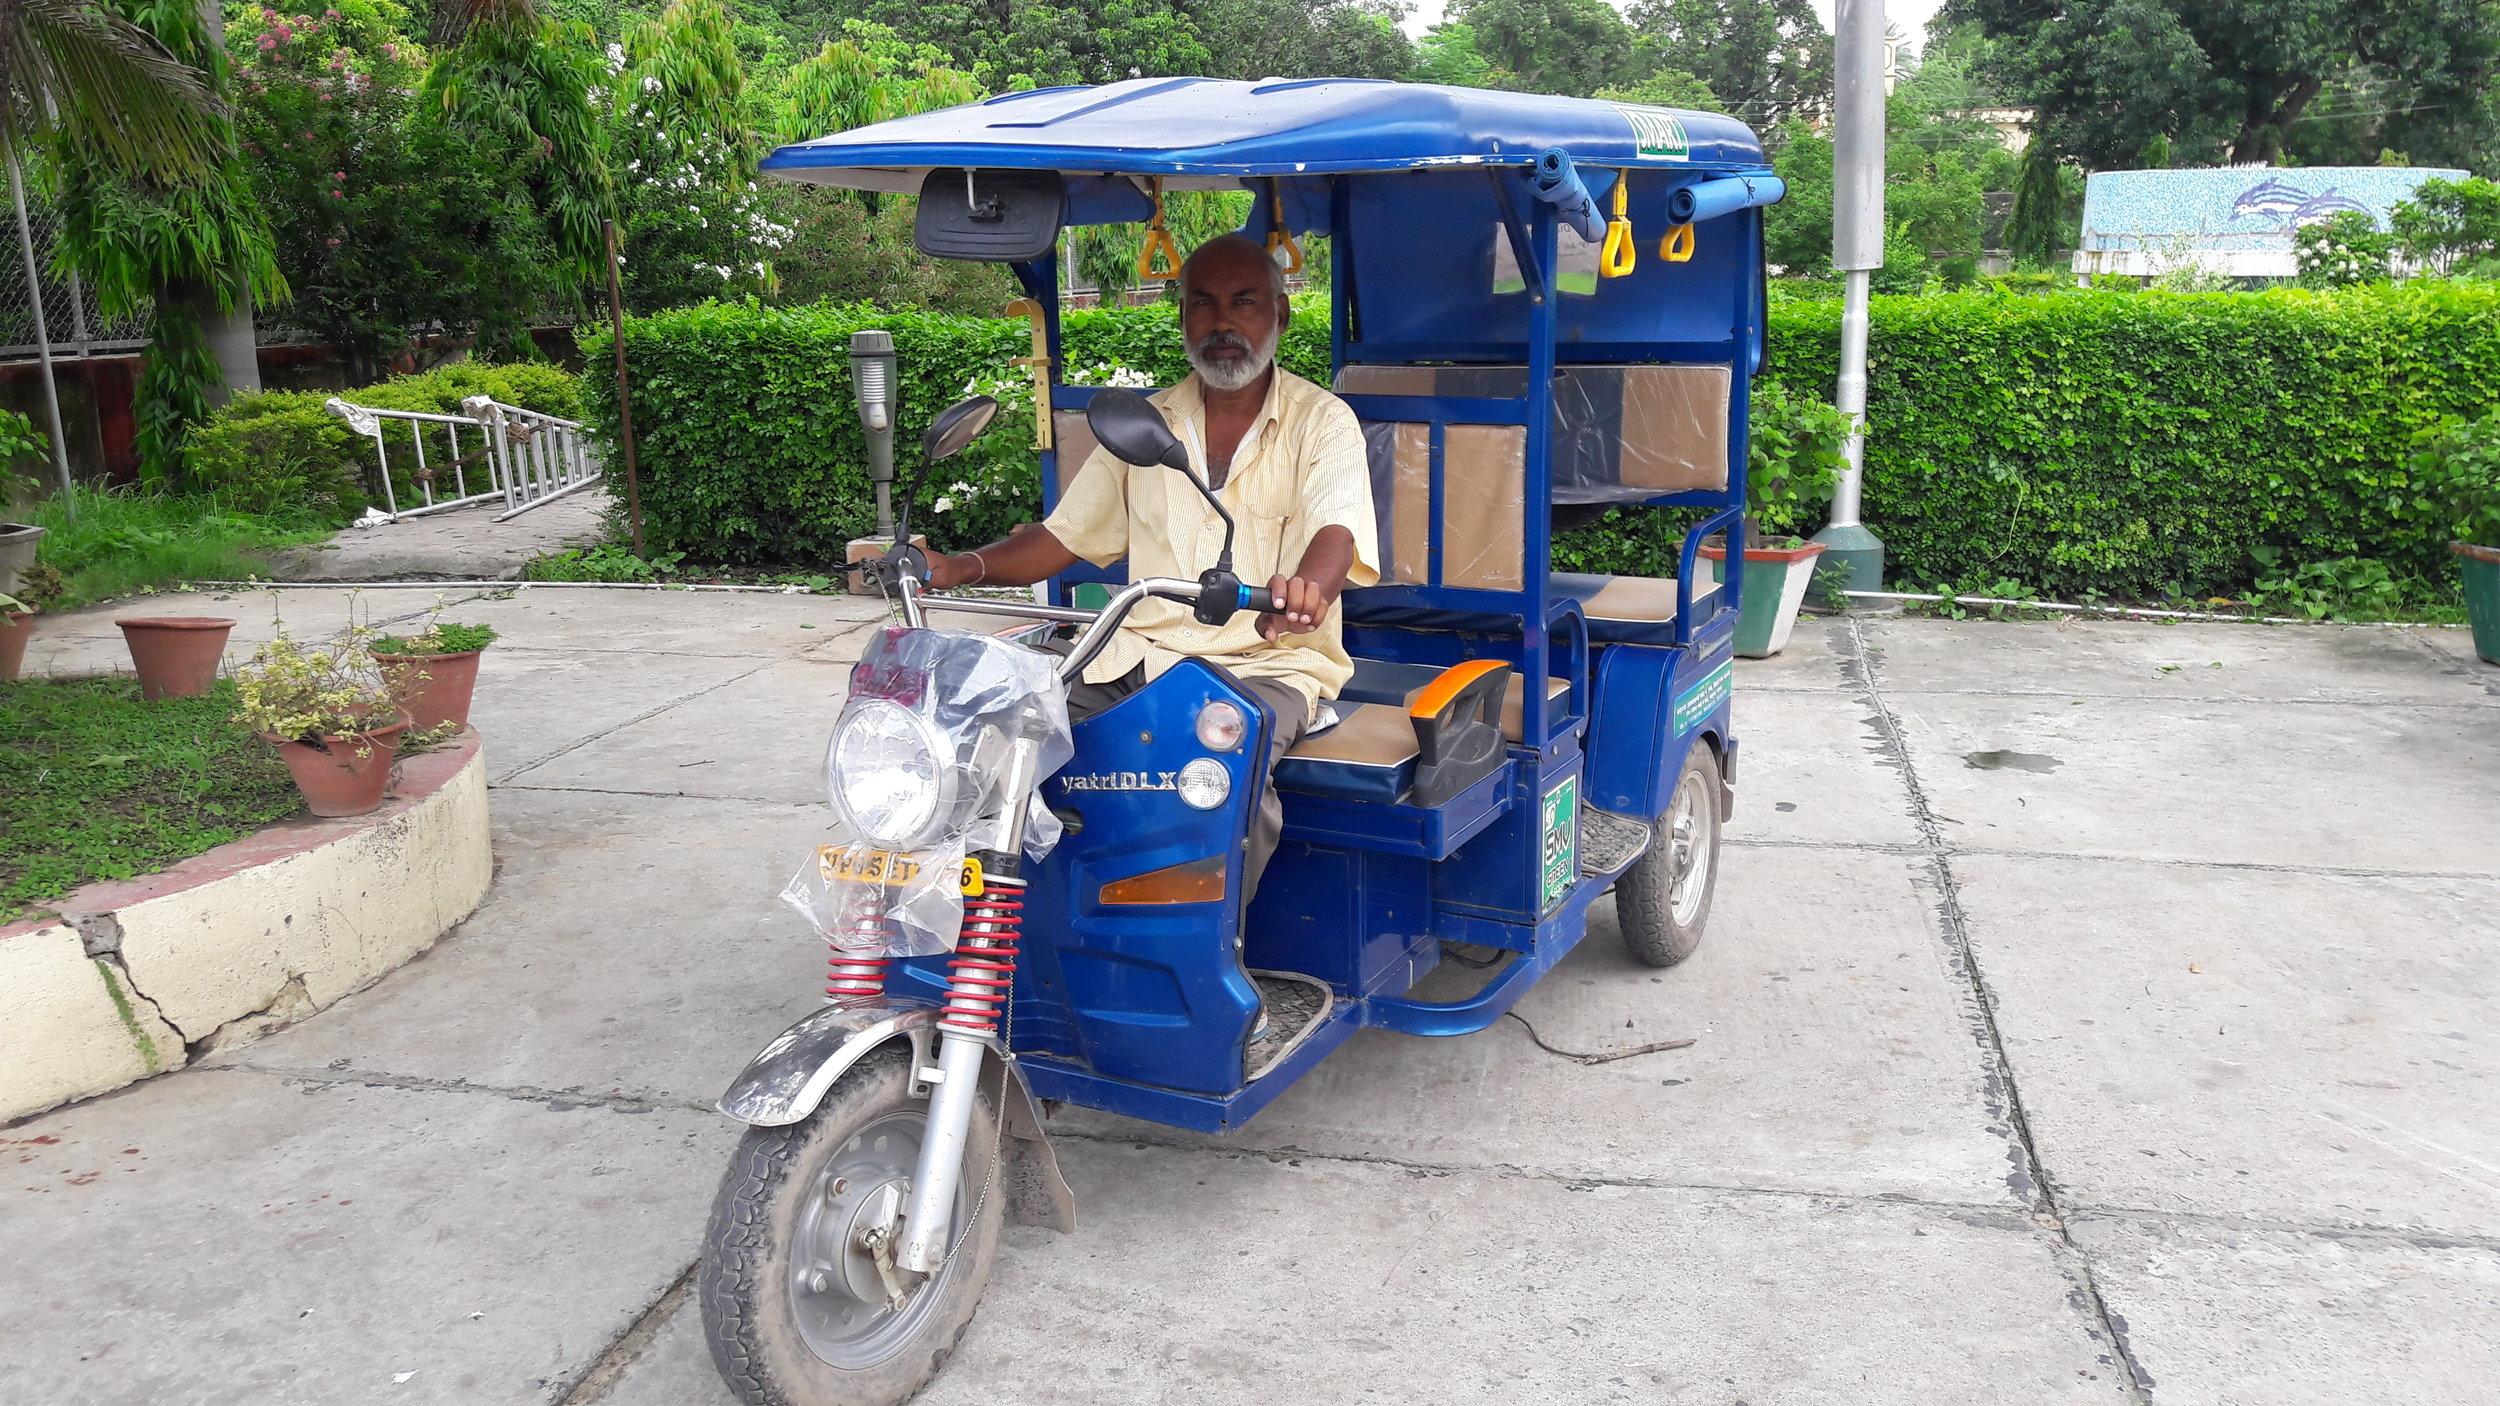 Rameesh, and SMV Rickshaw Driver